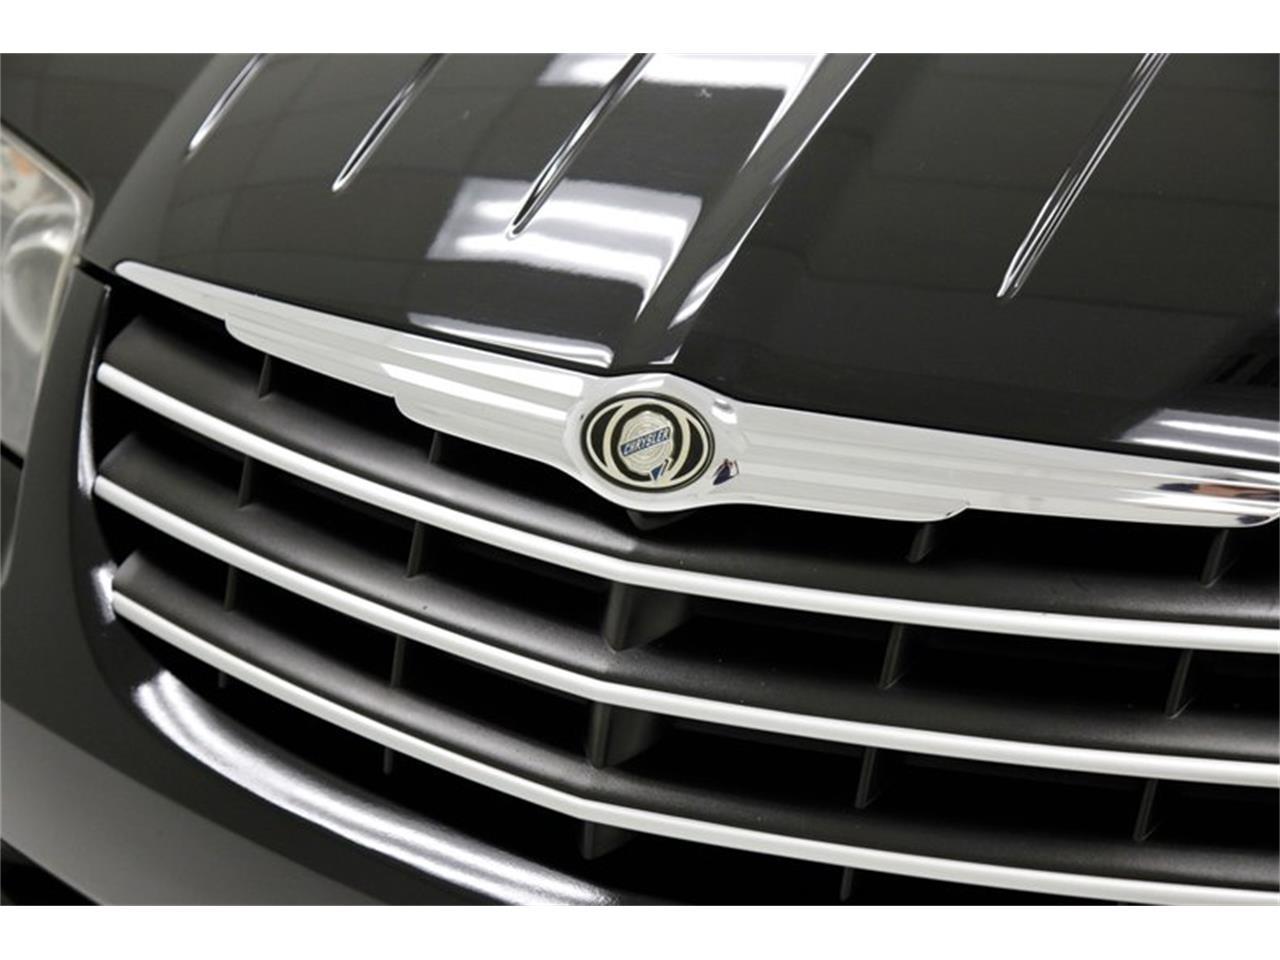 2007 Chrysler Crossfire (CC-1414108) for sale in Morgantown, Pennsylvania